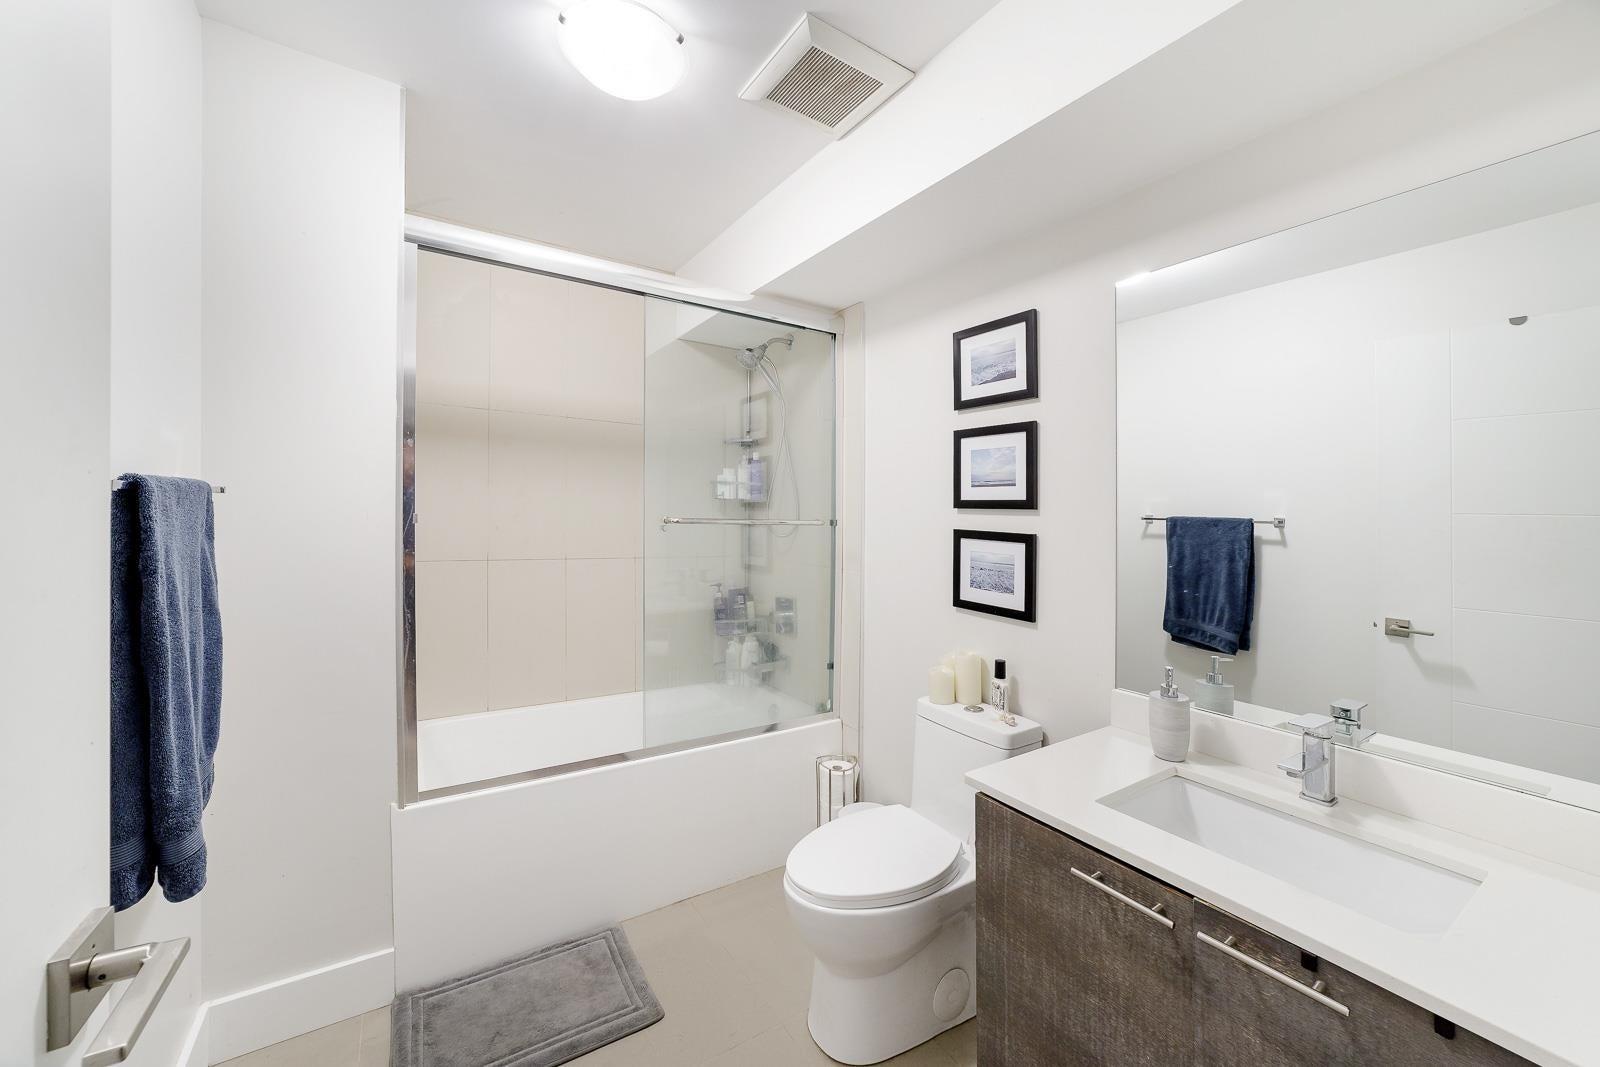 517 GRANADA CRESCENT - Upper Delbrook House/Single Family for sale, 8 Bedrooms (R2615057) - #31